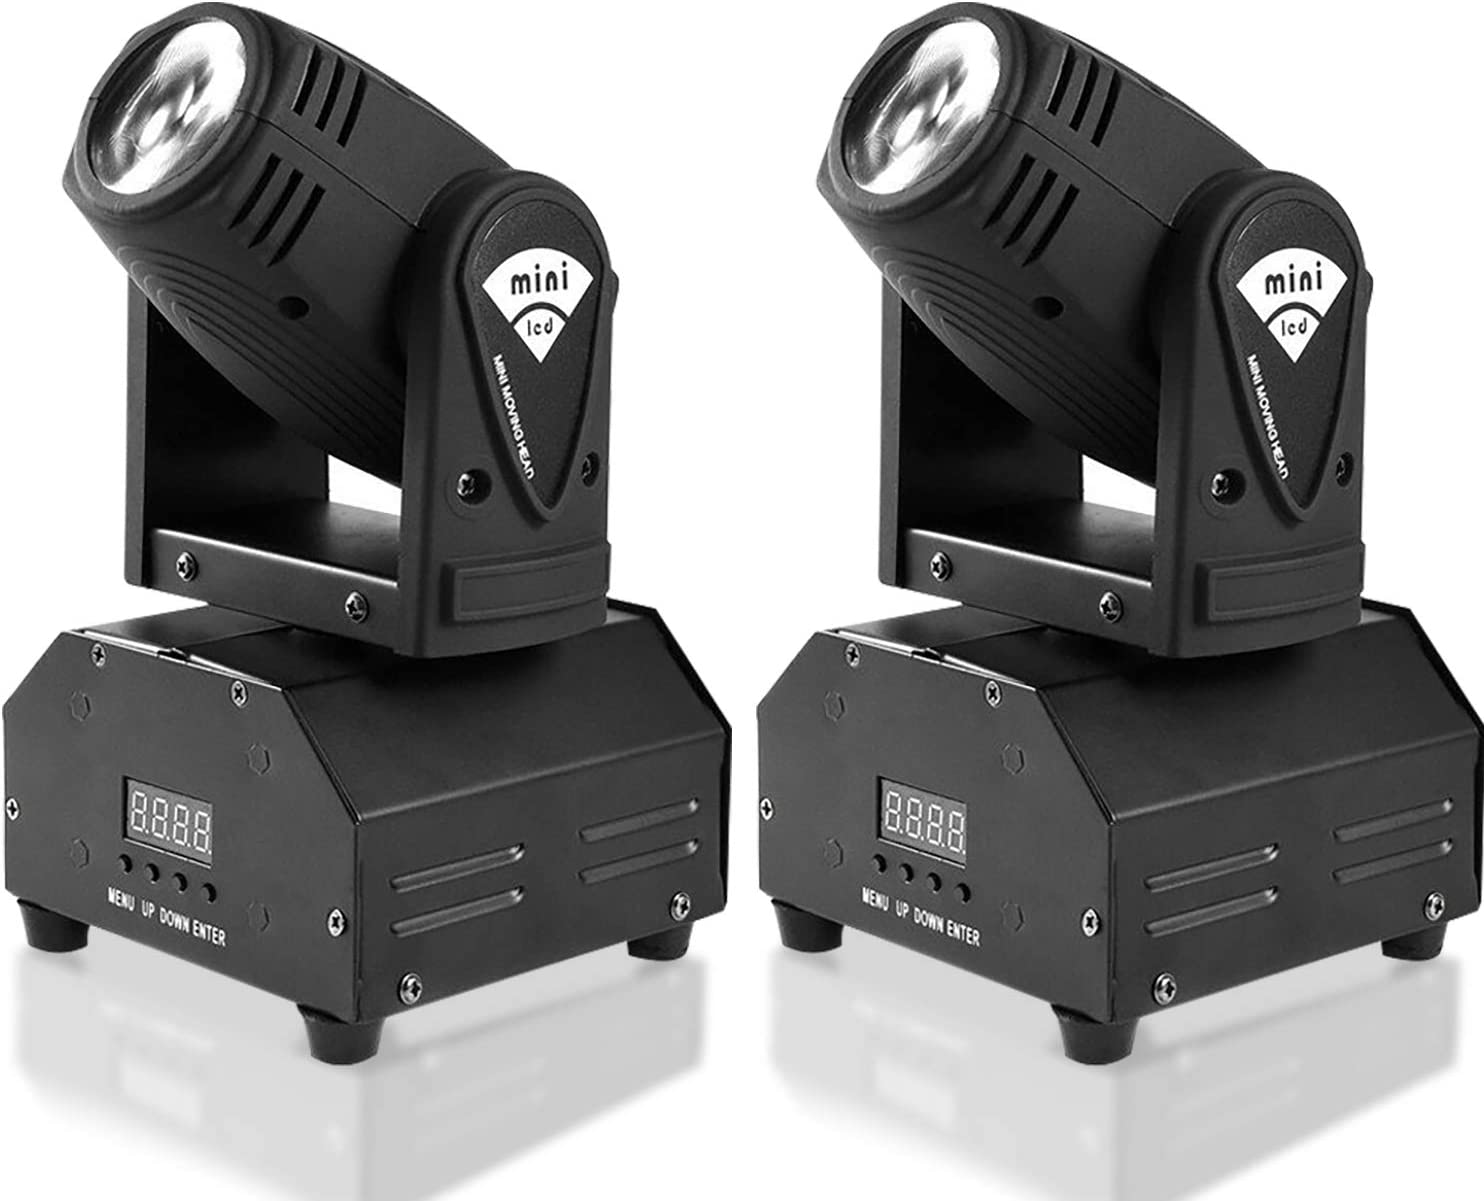 Amazon.com: MFL. 10w LED Moving Head Light RGBW Stage Light Mini Moving  Beams Rotating Moving Head DMX512 Sound Activated Master-slave Auto Running  for DJ Party Disco KTV Nightclub Lives 2 pcs(Beam Light):